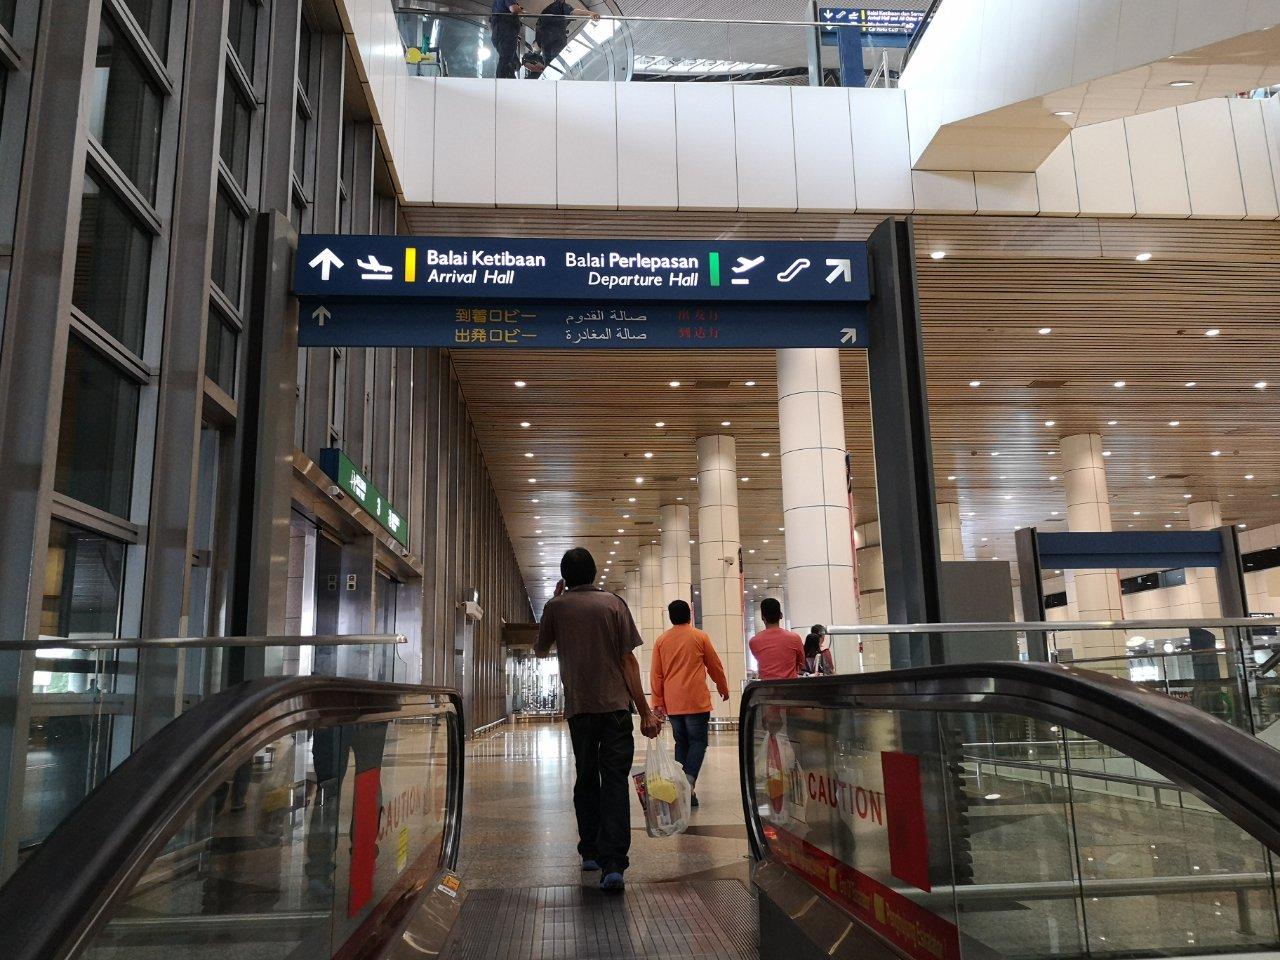 KLセントラル駅からバスでクアラルンプール国際空港にバスで移動する方法30